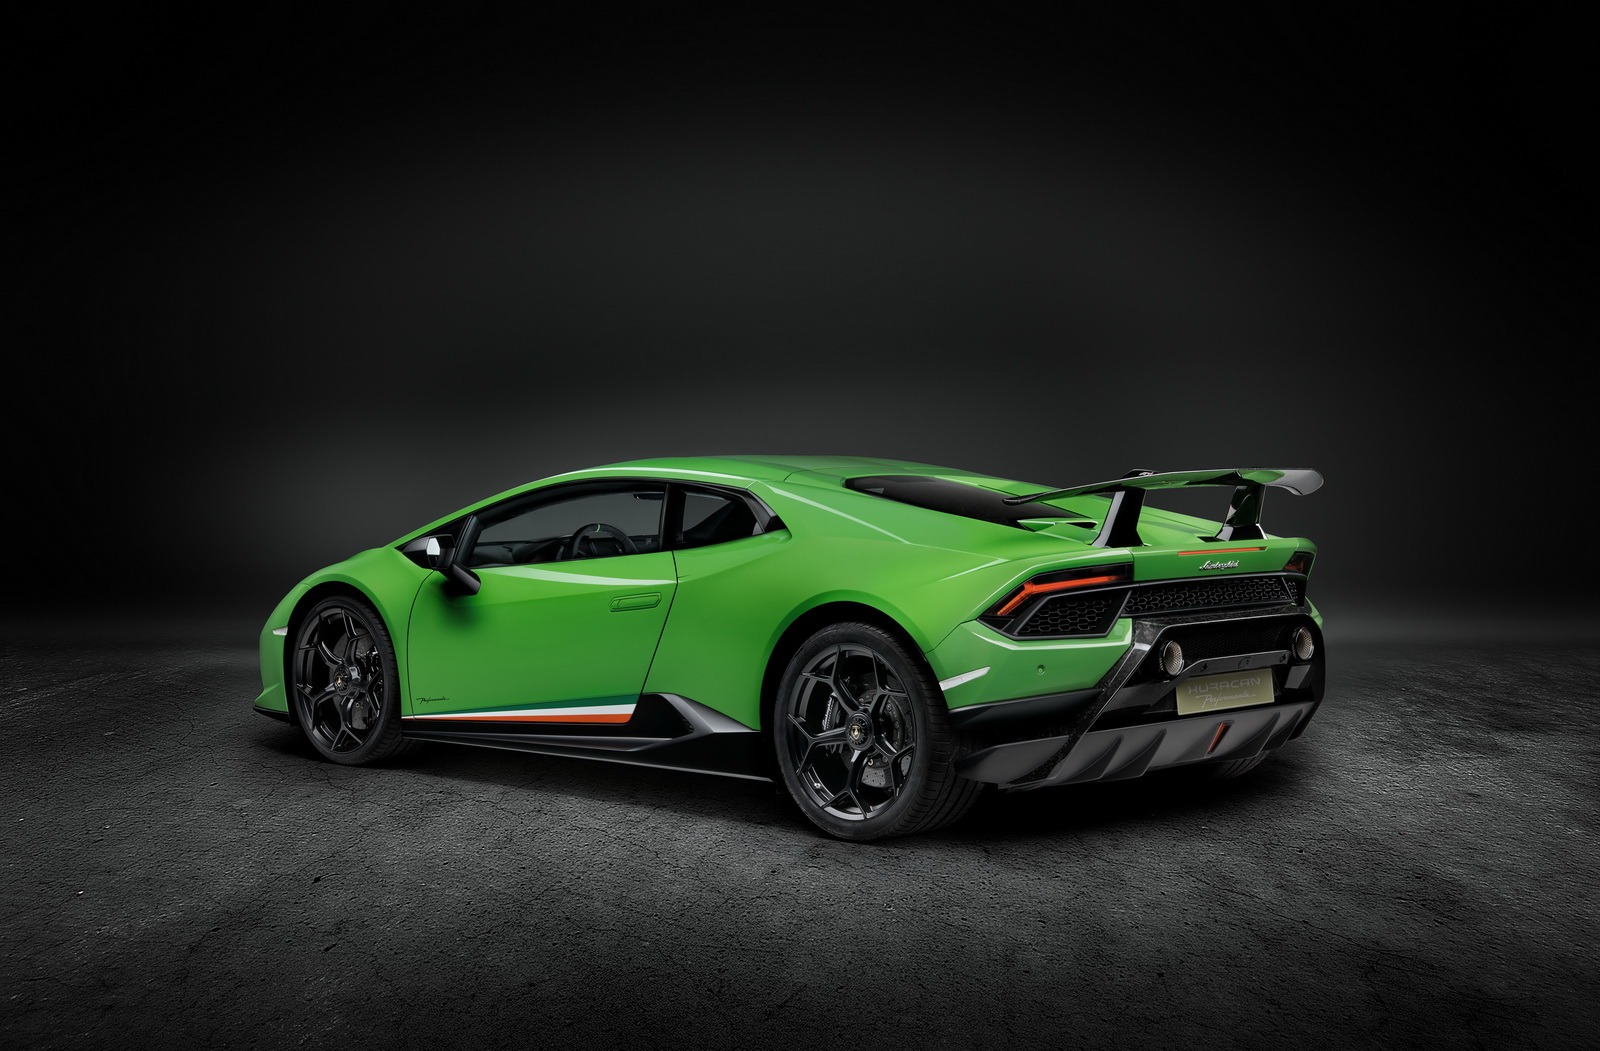 Lamborghini Huracan Performante 2018 (2)